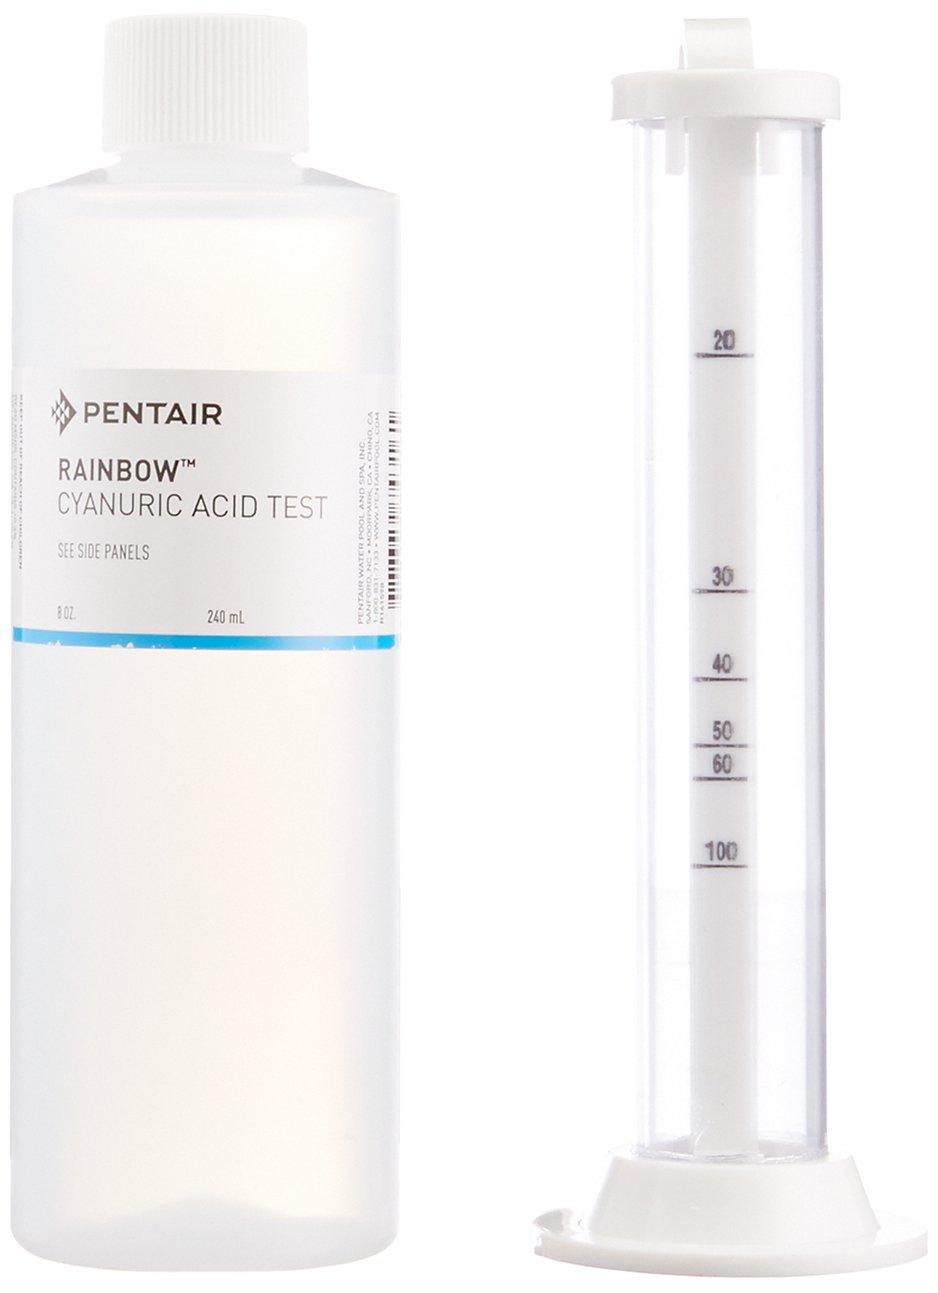 Pentair R151226 79 Cyanuric Acid Test Kit by Pentair